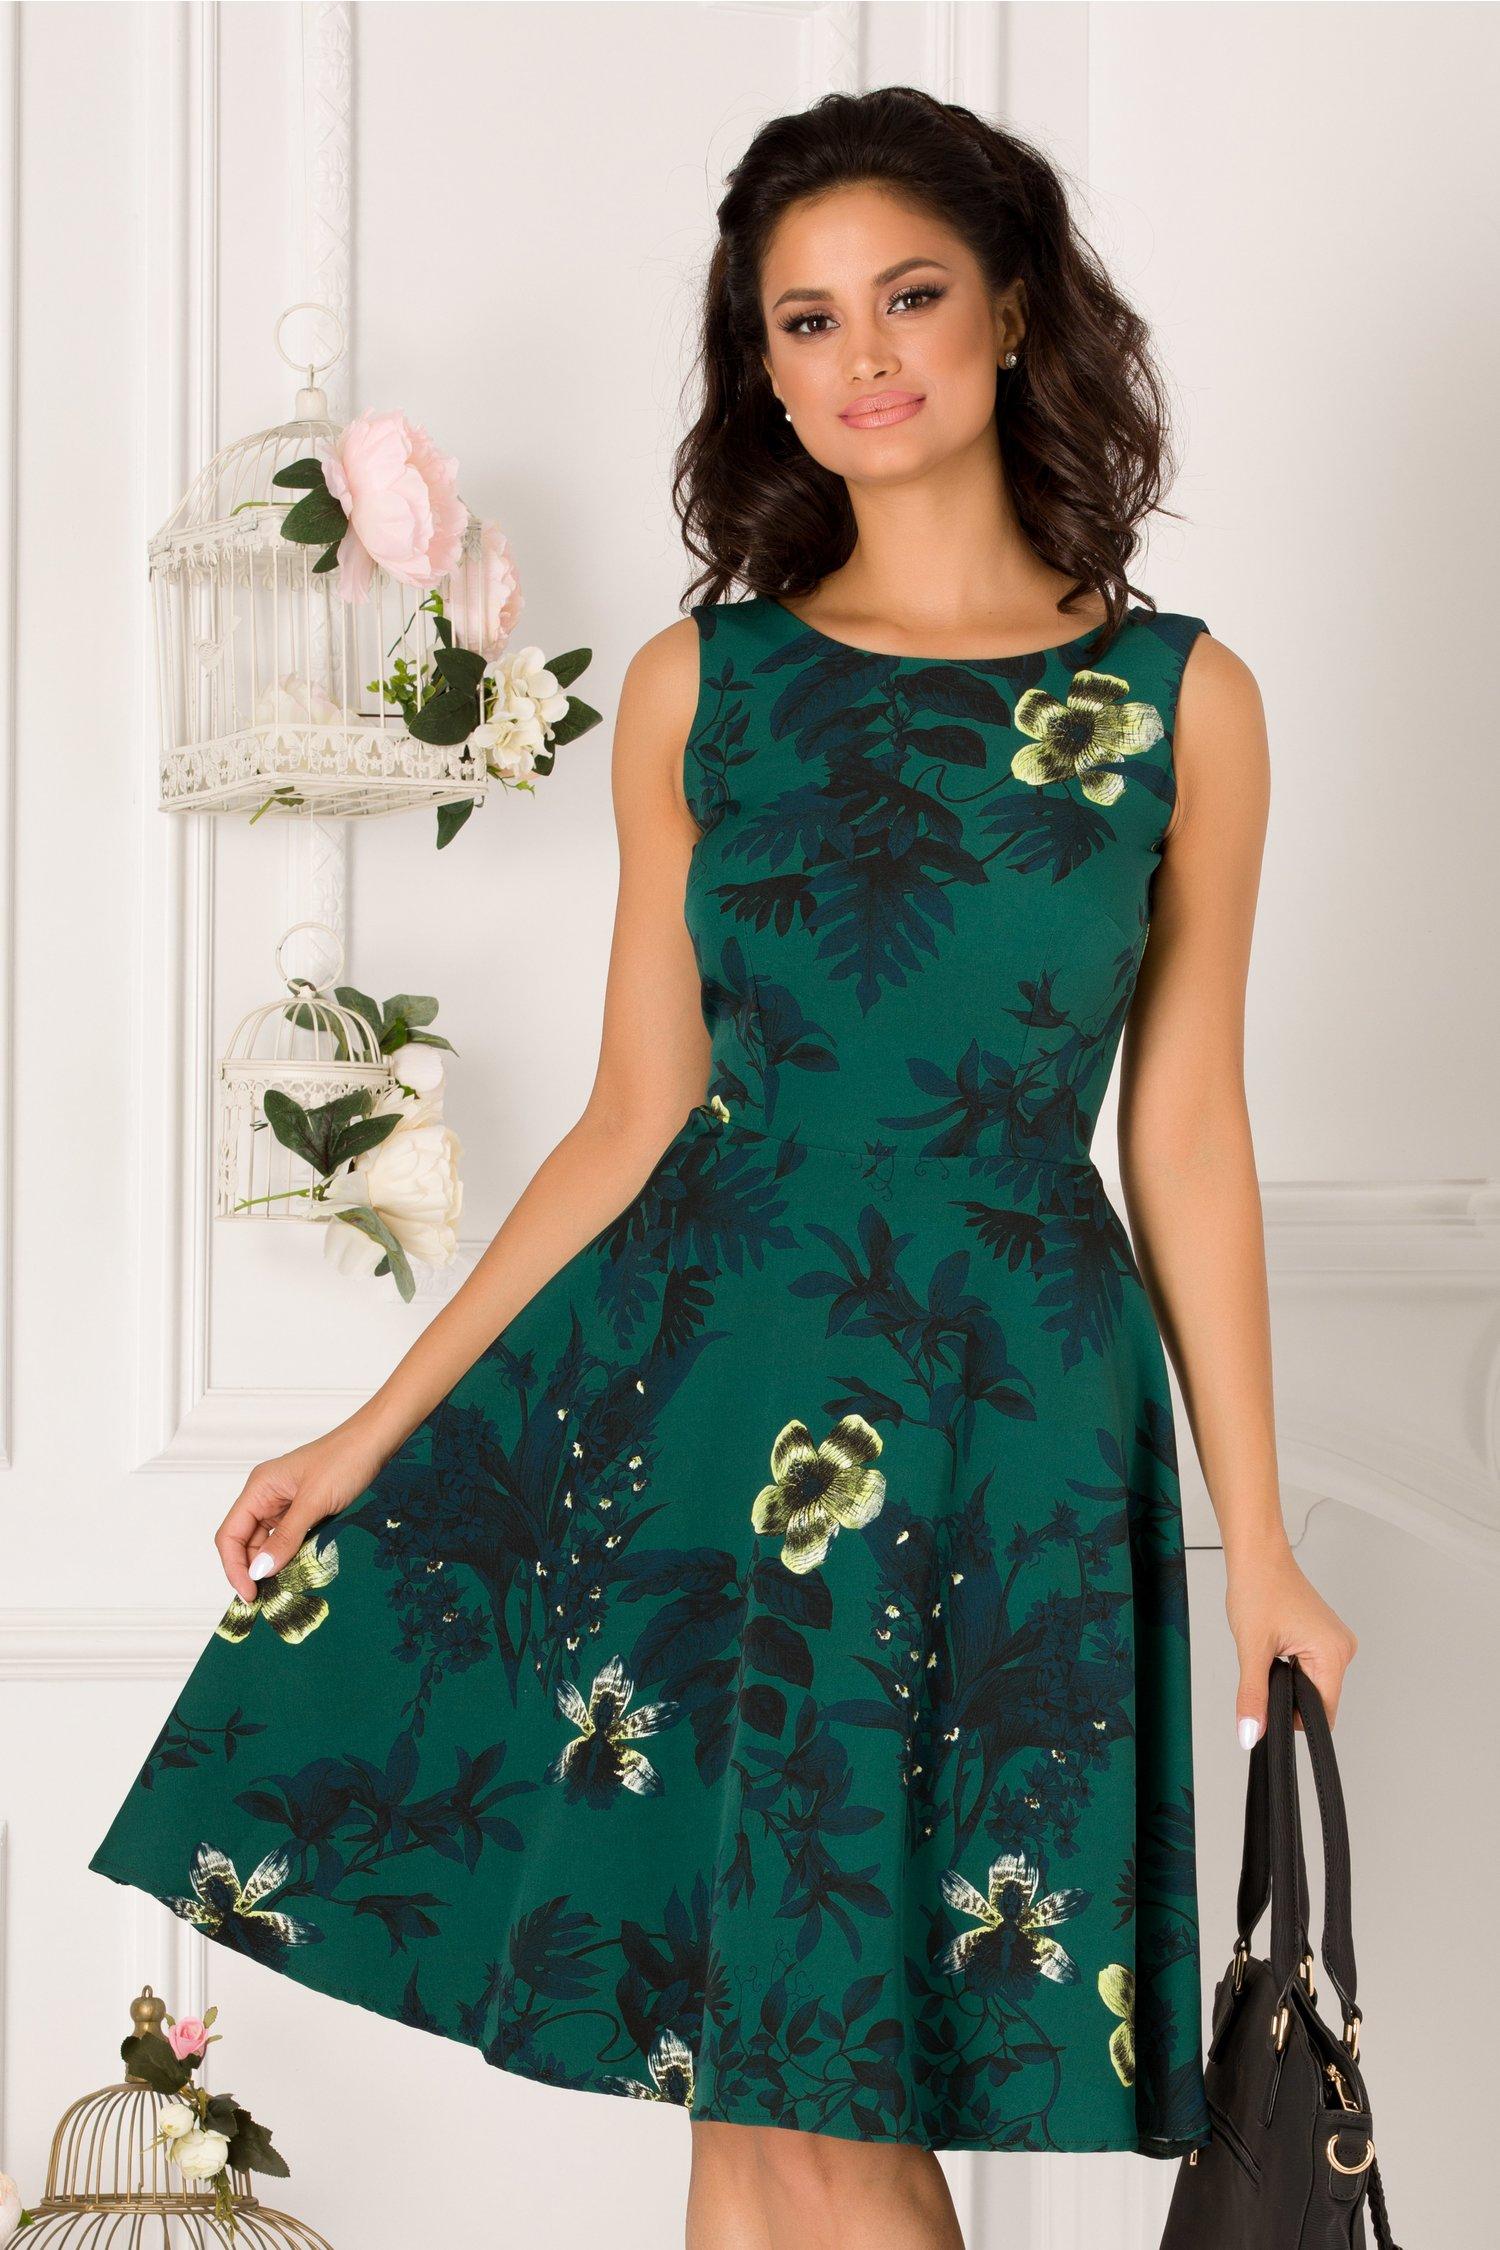 Rochie Pamy verde inchis cu imprimeuri florale